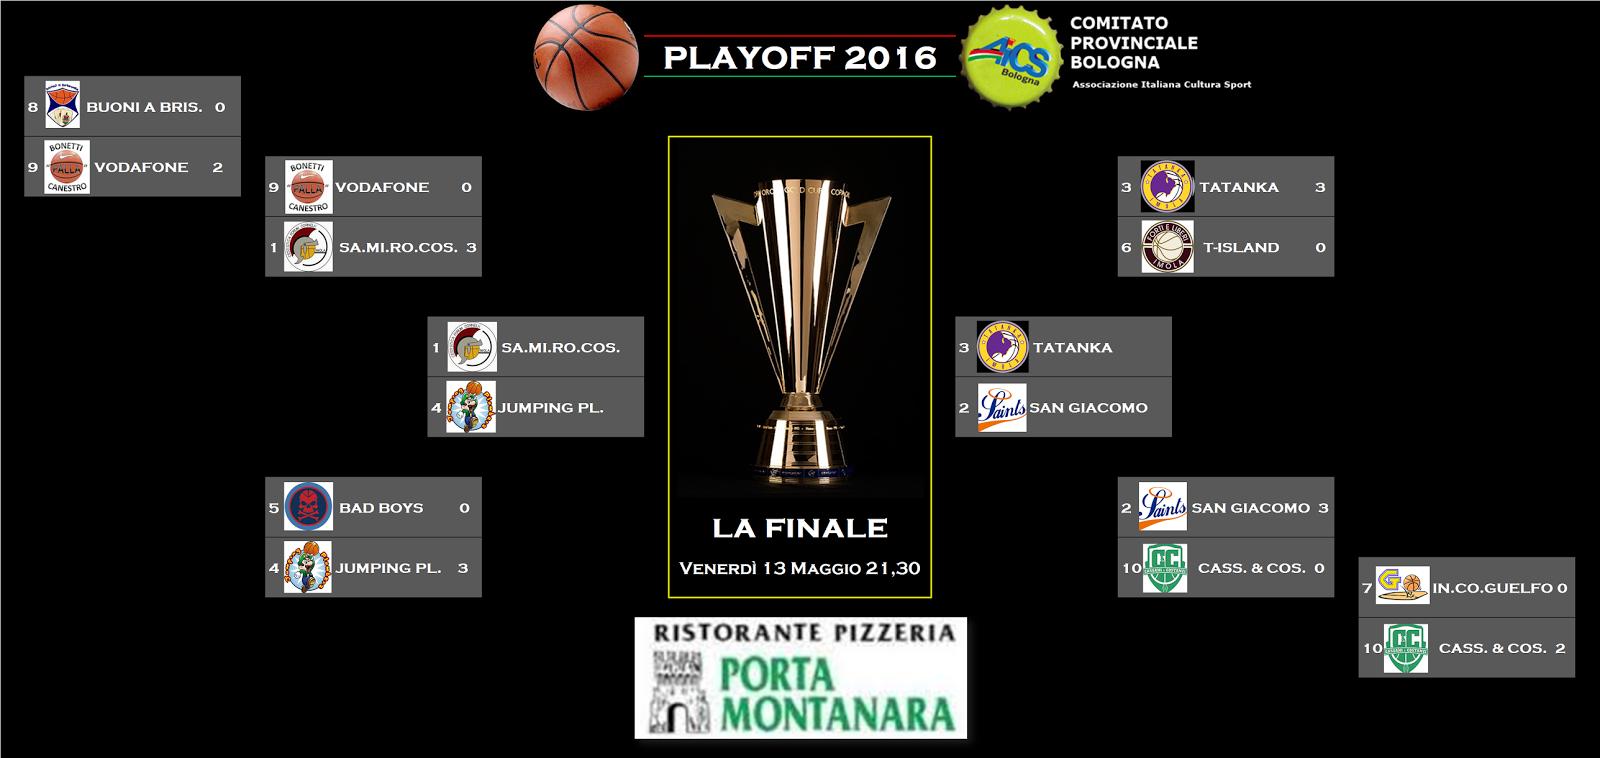 Basket amatori imola 3a porta montanara cup tabellone - Porta montanara imola ...